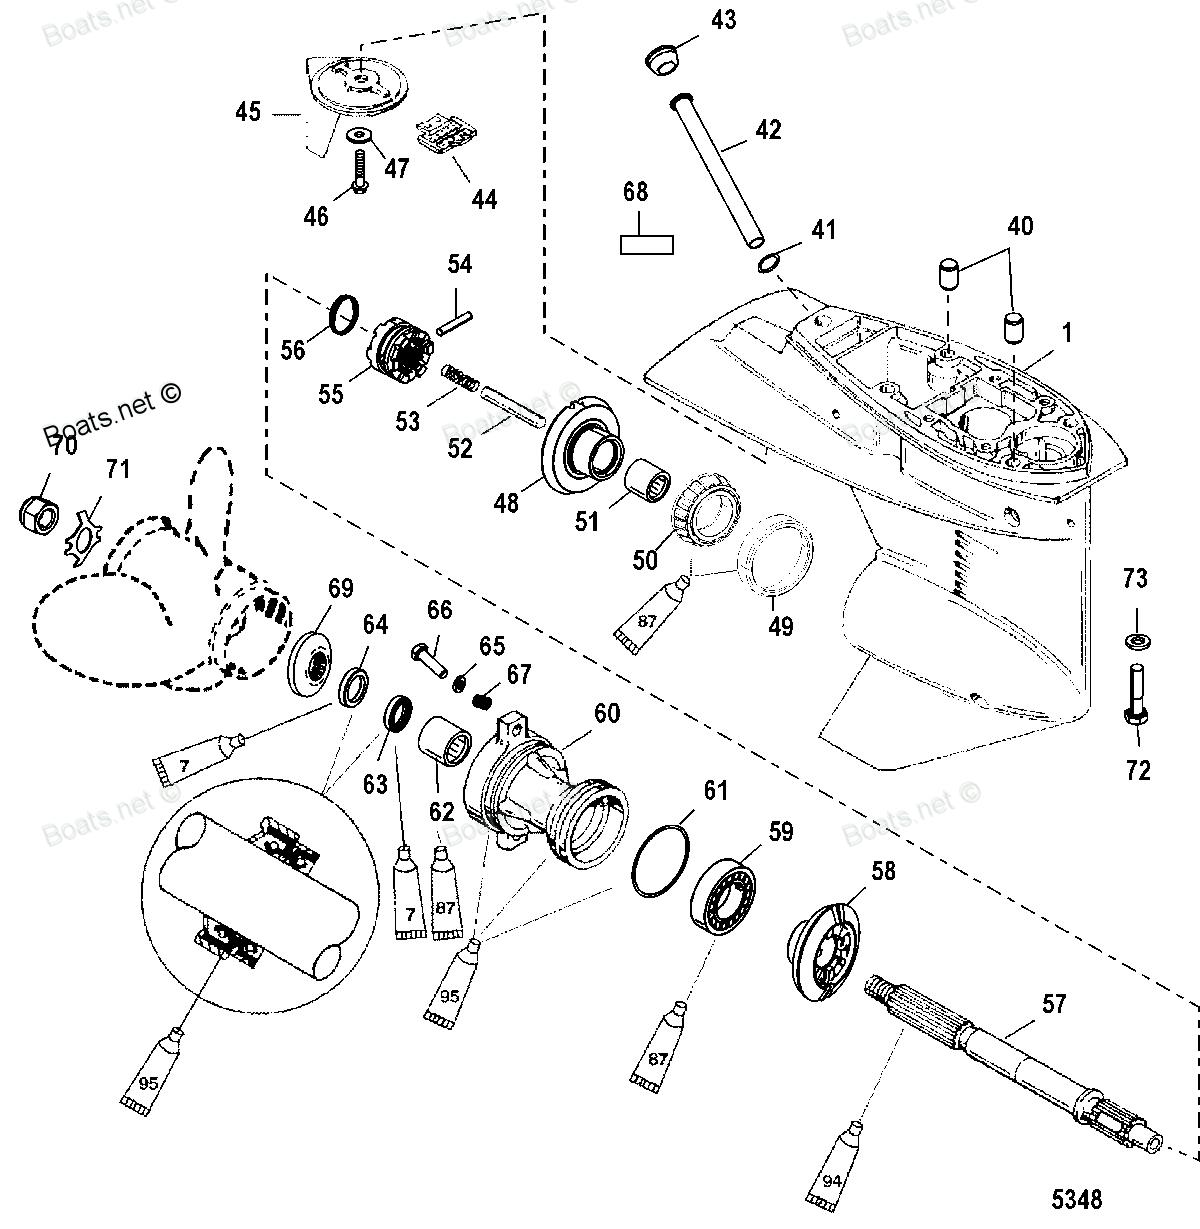 гребной винт для лодочного мотора меркурий 40ео